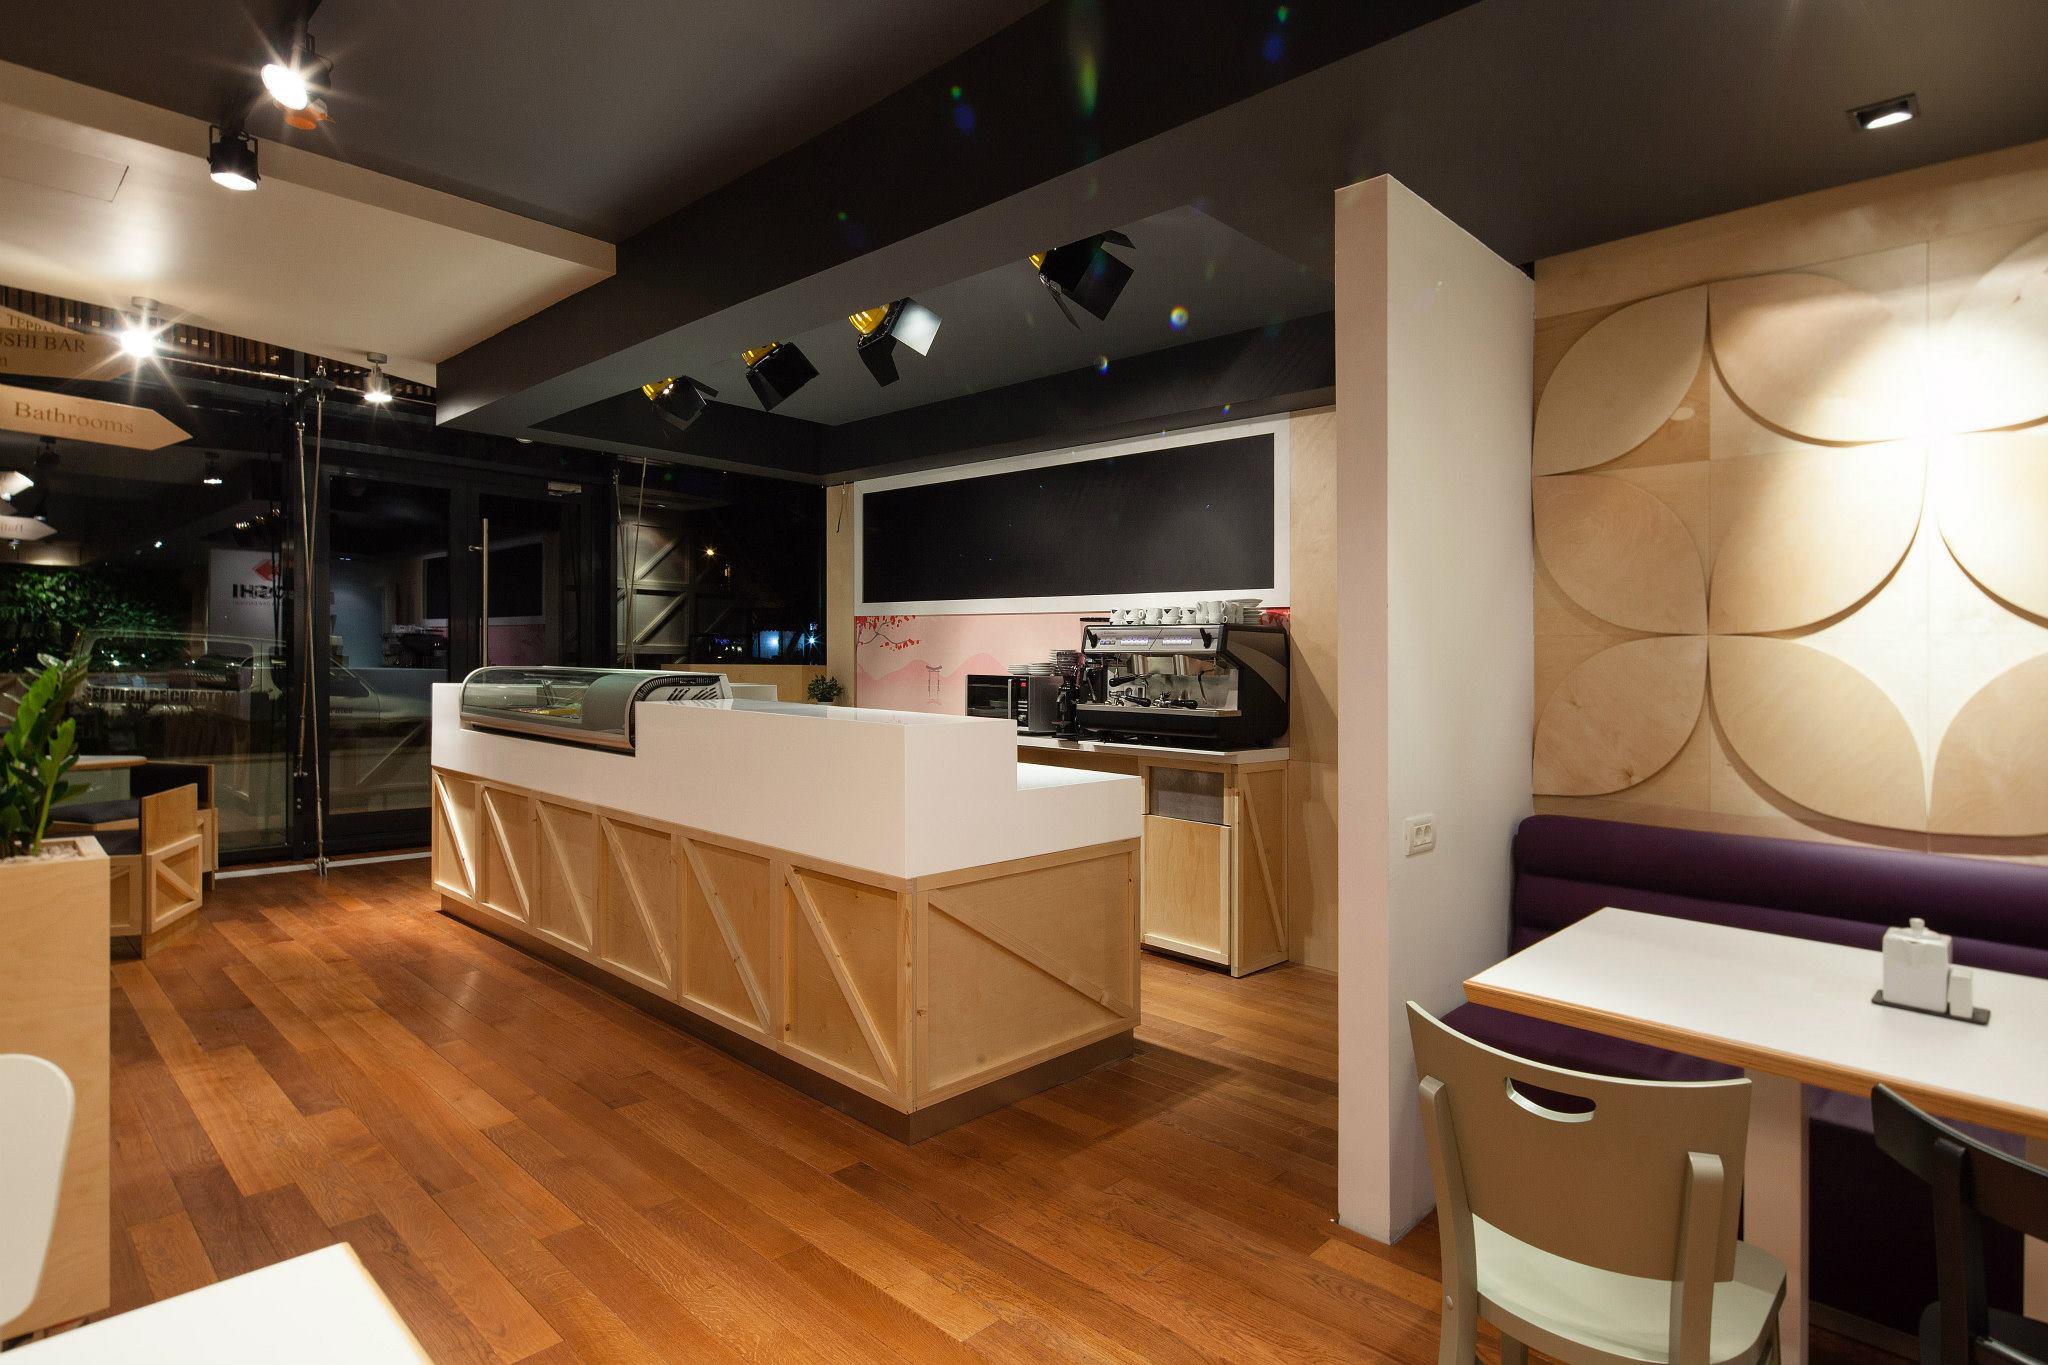 YOSHI-Sushi-Teppanyaki-Trivenus-Ama-Design-14